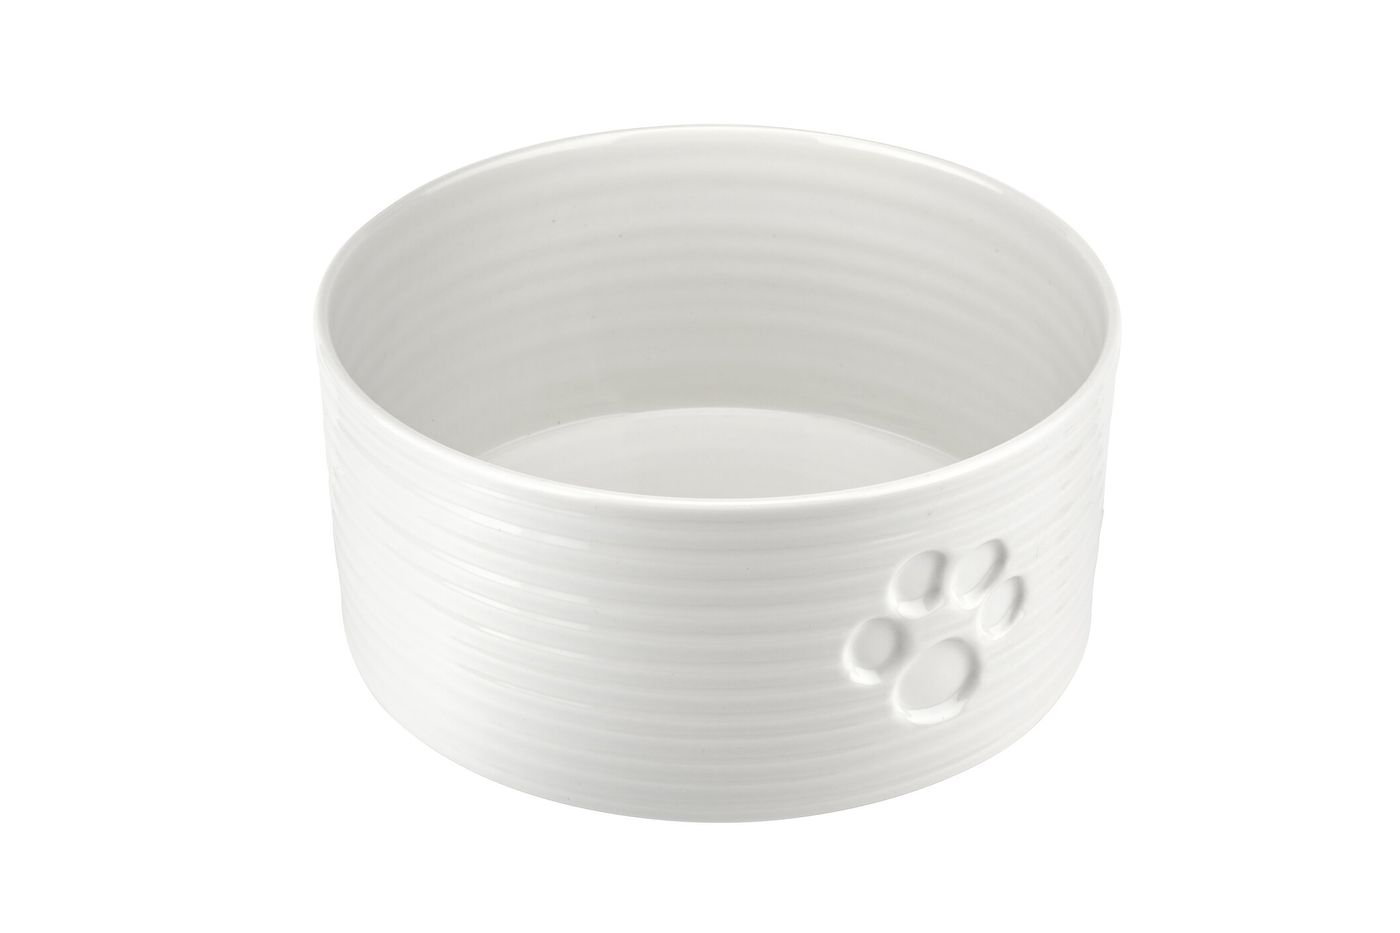 Sophie Conran for Portmeirion White Pet Bowl 19.5cm thumb 2